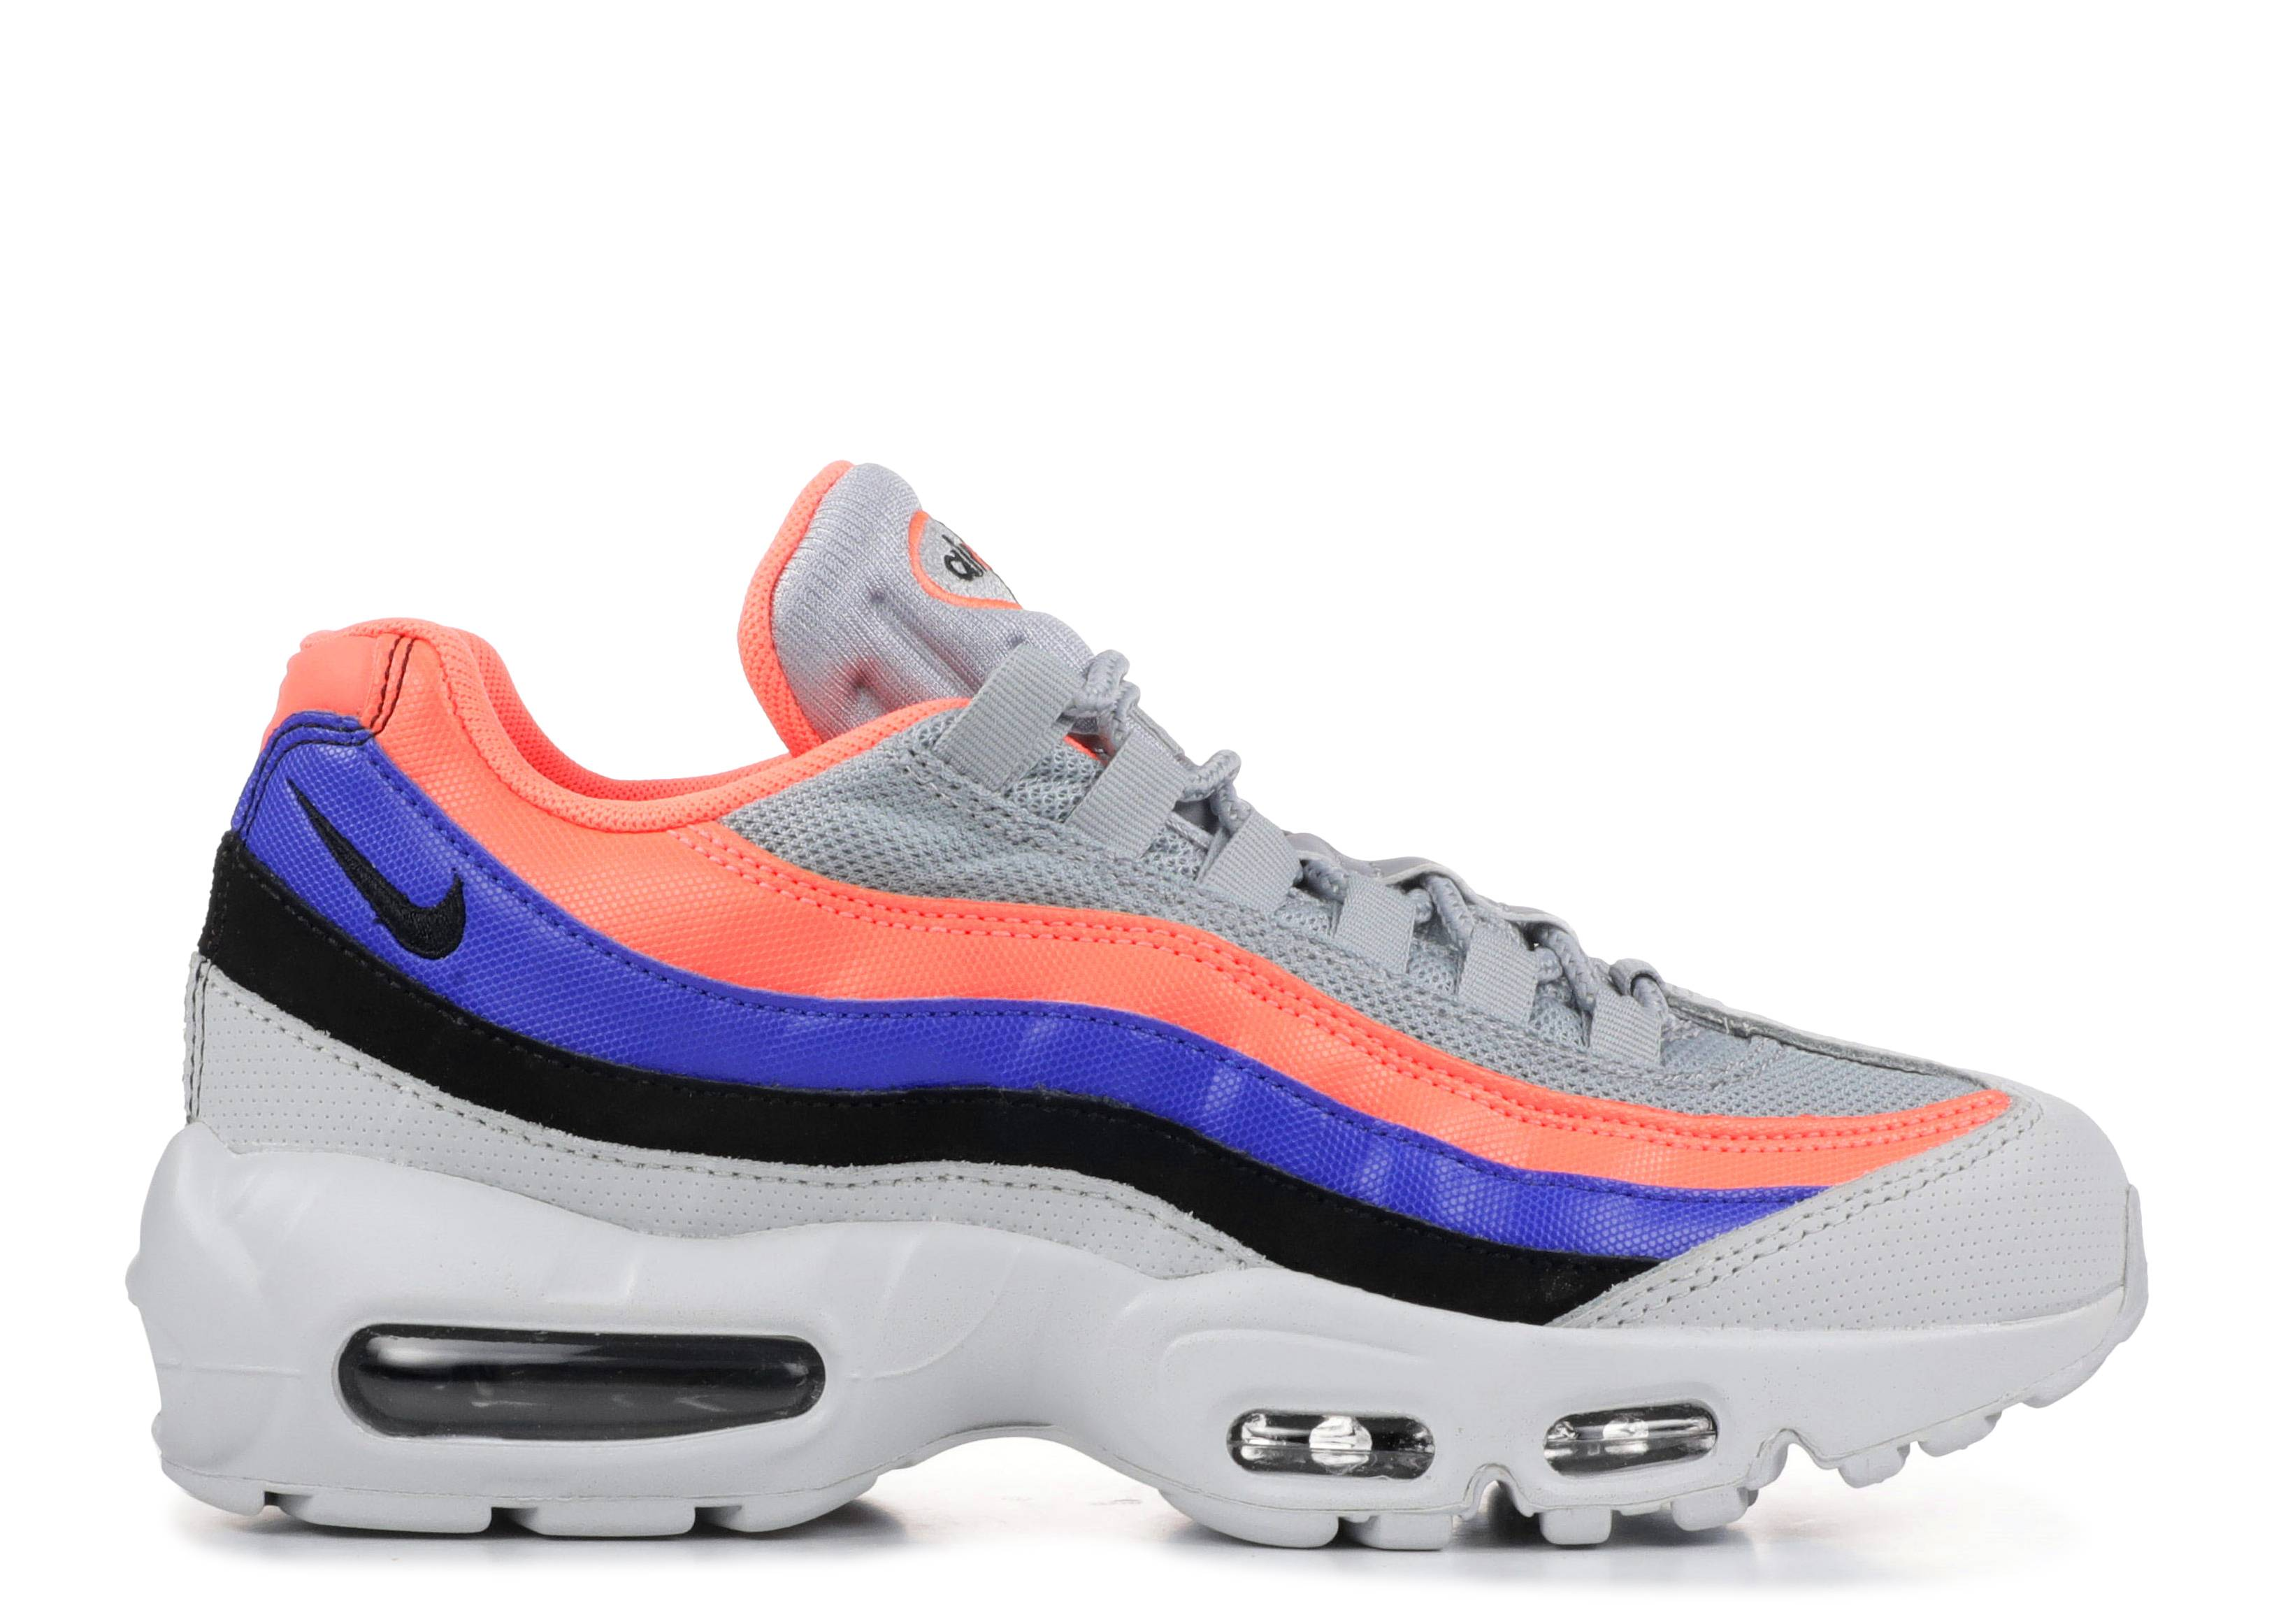 f8c9e7389 Air Max 95 - Nike - 749766 035 - pure platinum/bright mango   Flight ...